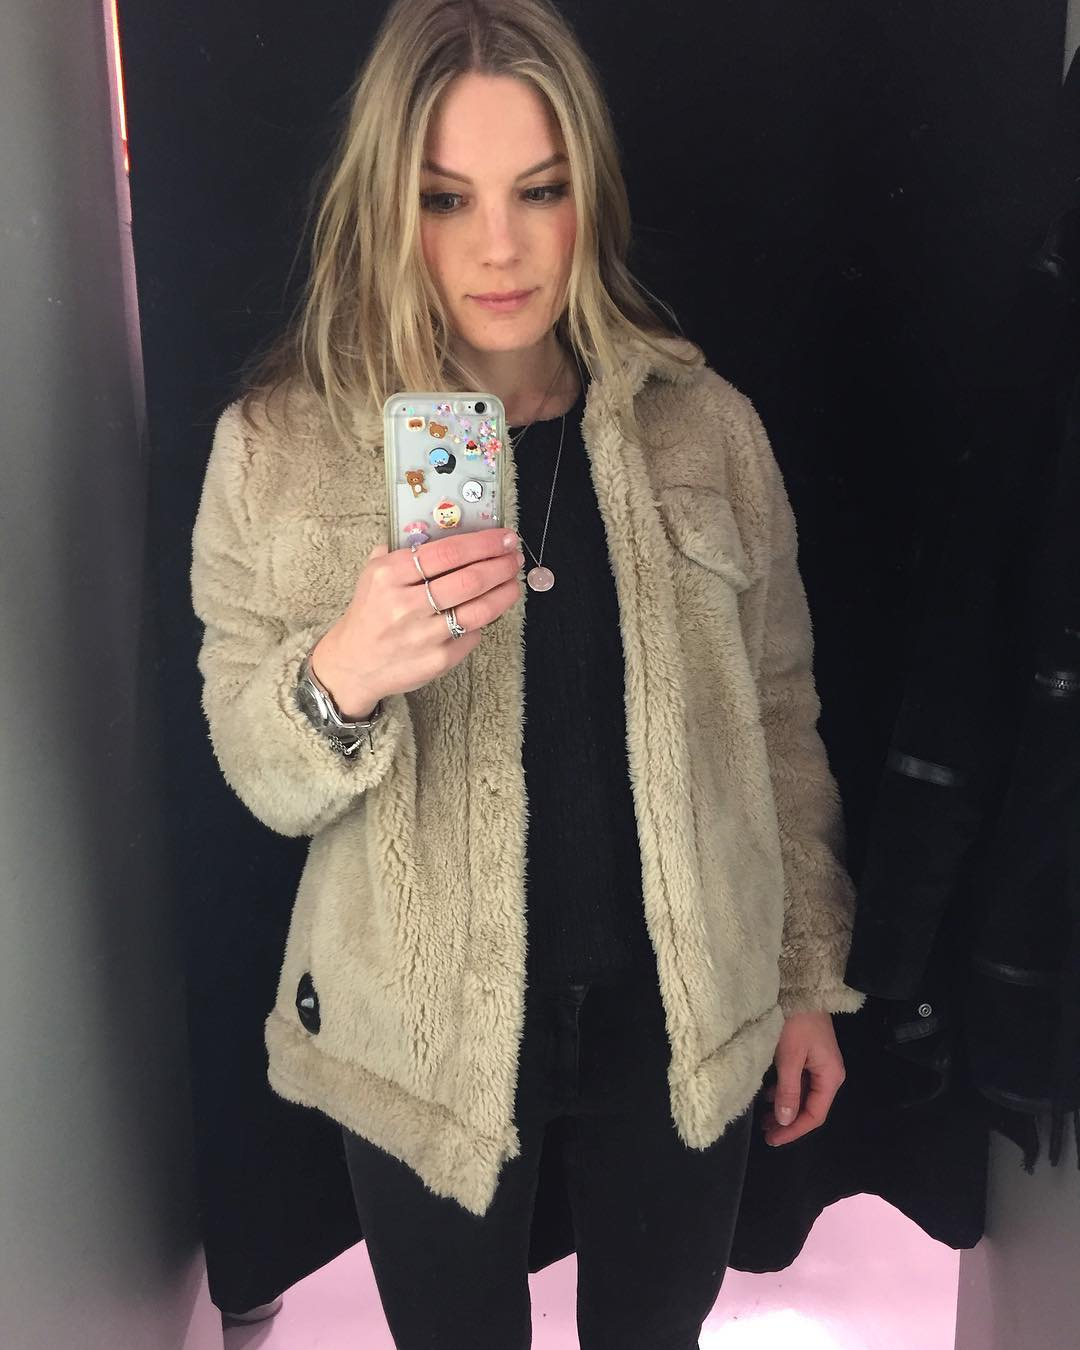 Another mirror selfie in another warm jacket  Bye Oslo!hellip